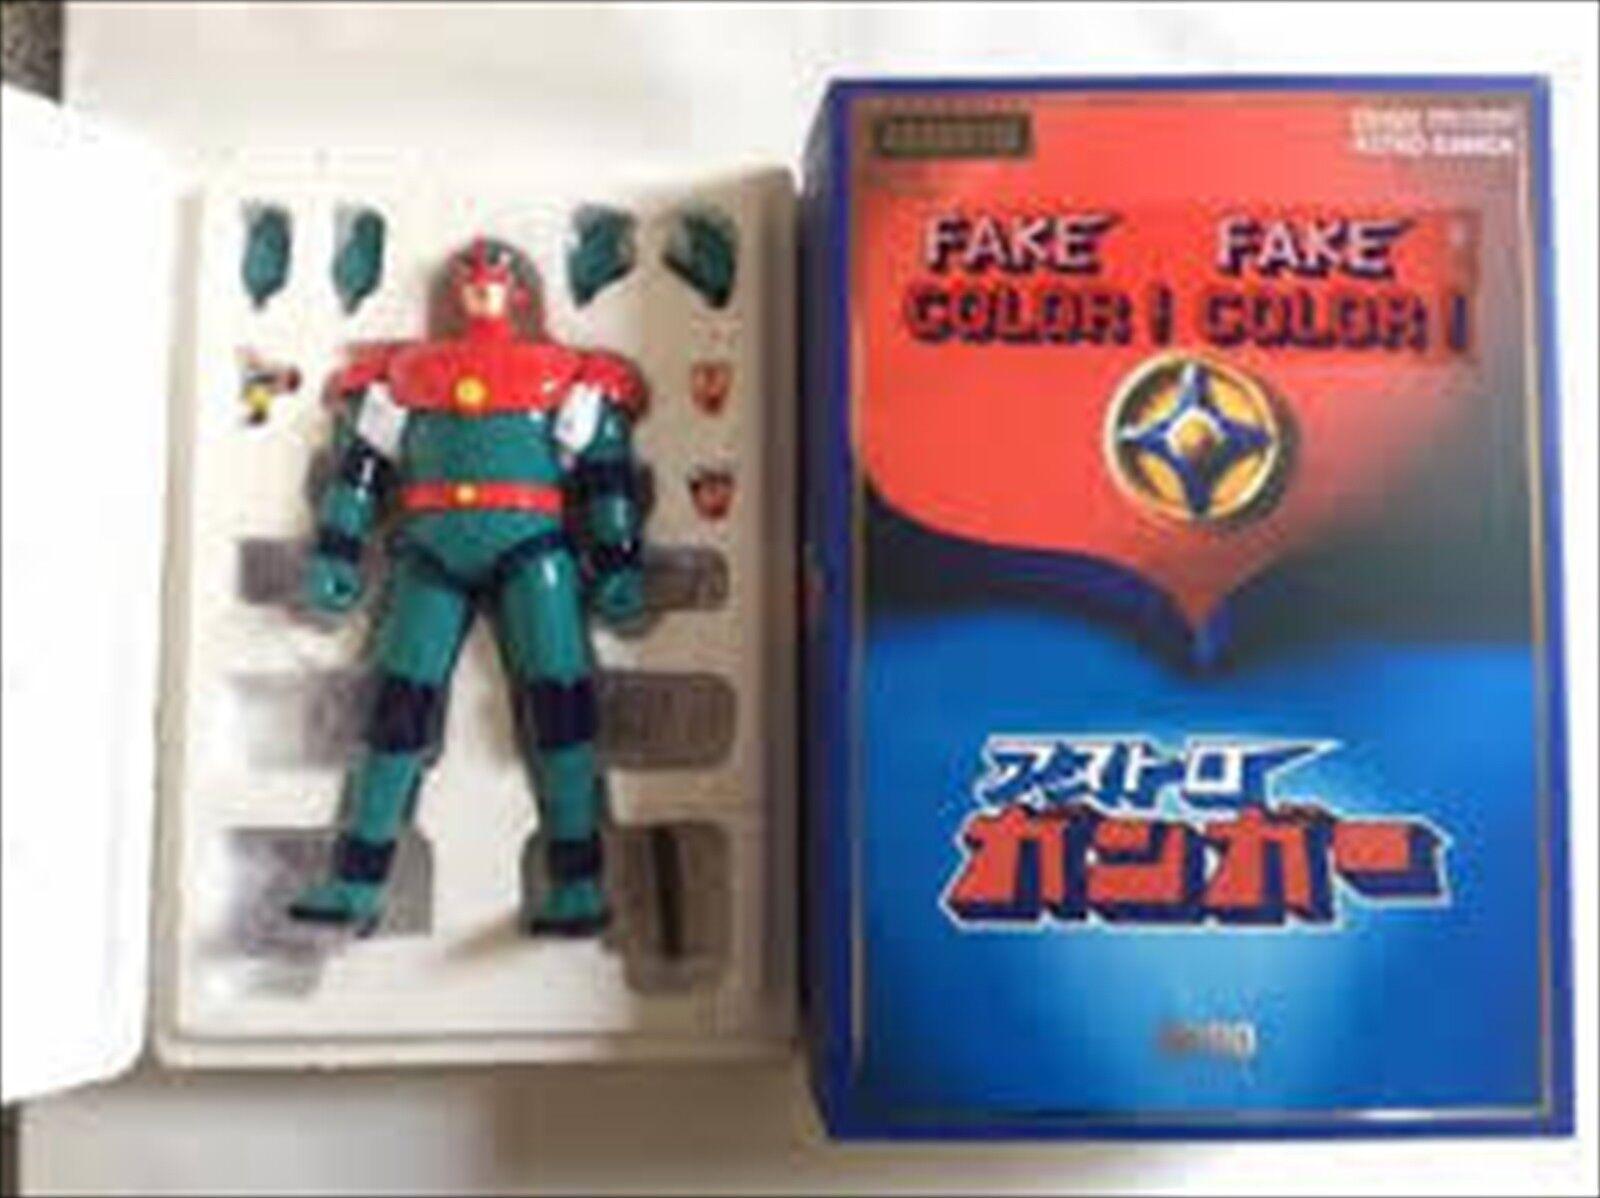 Astroganger Astroganger Astroganger Fake color Ver. Figure  Medicom Toy CARBOTIX 5PRO STUDIO new japan 951c55